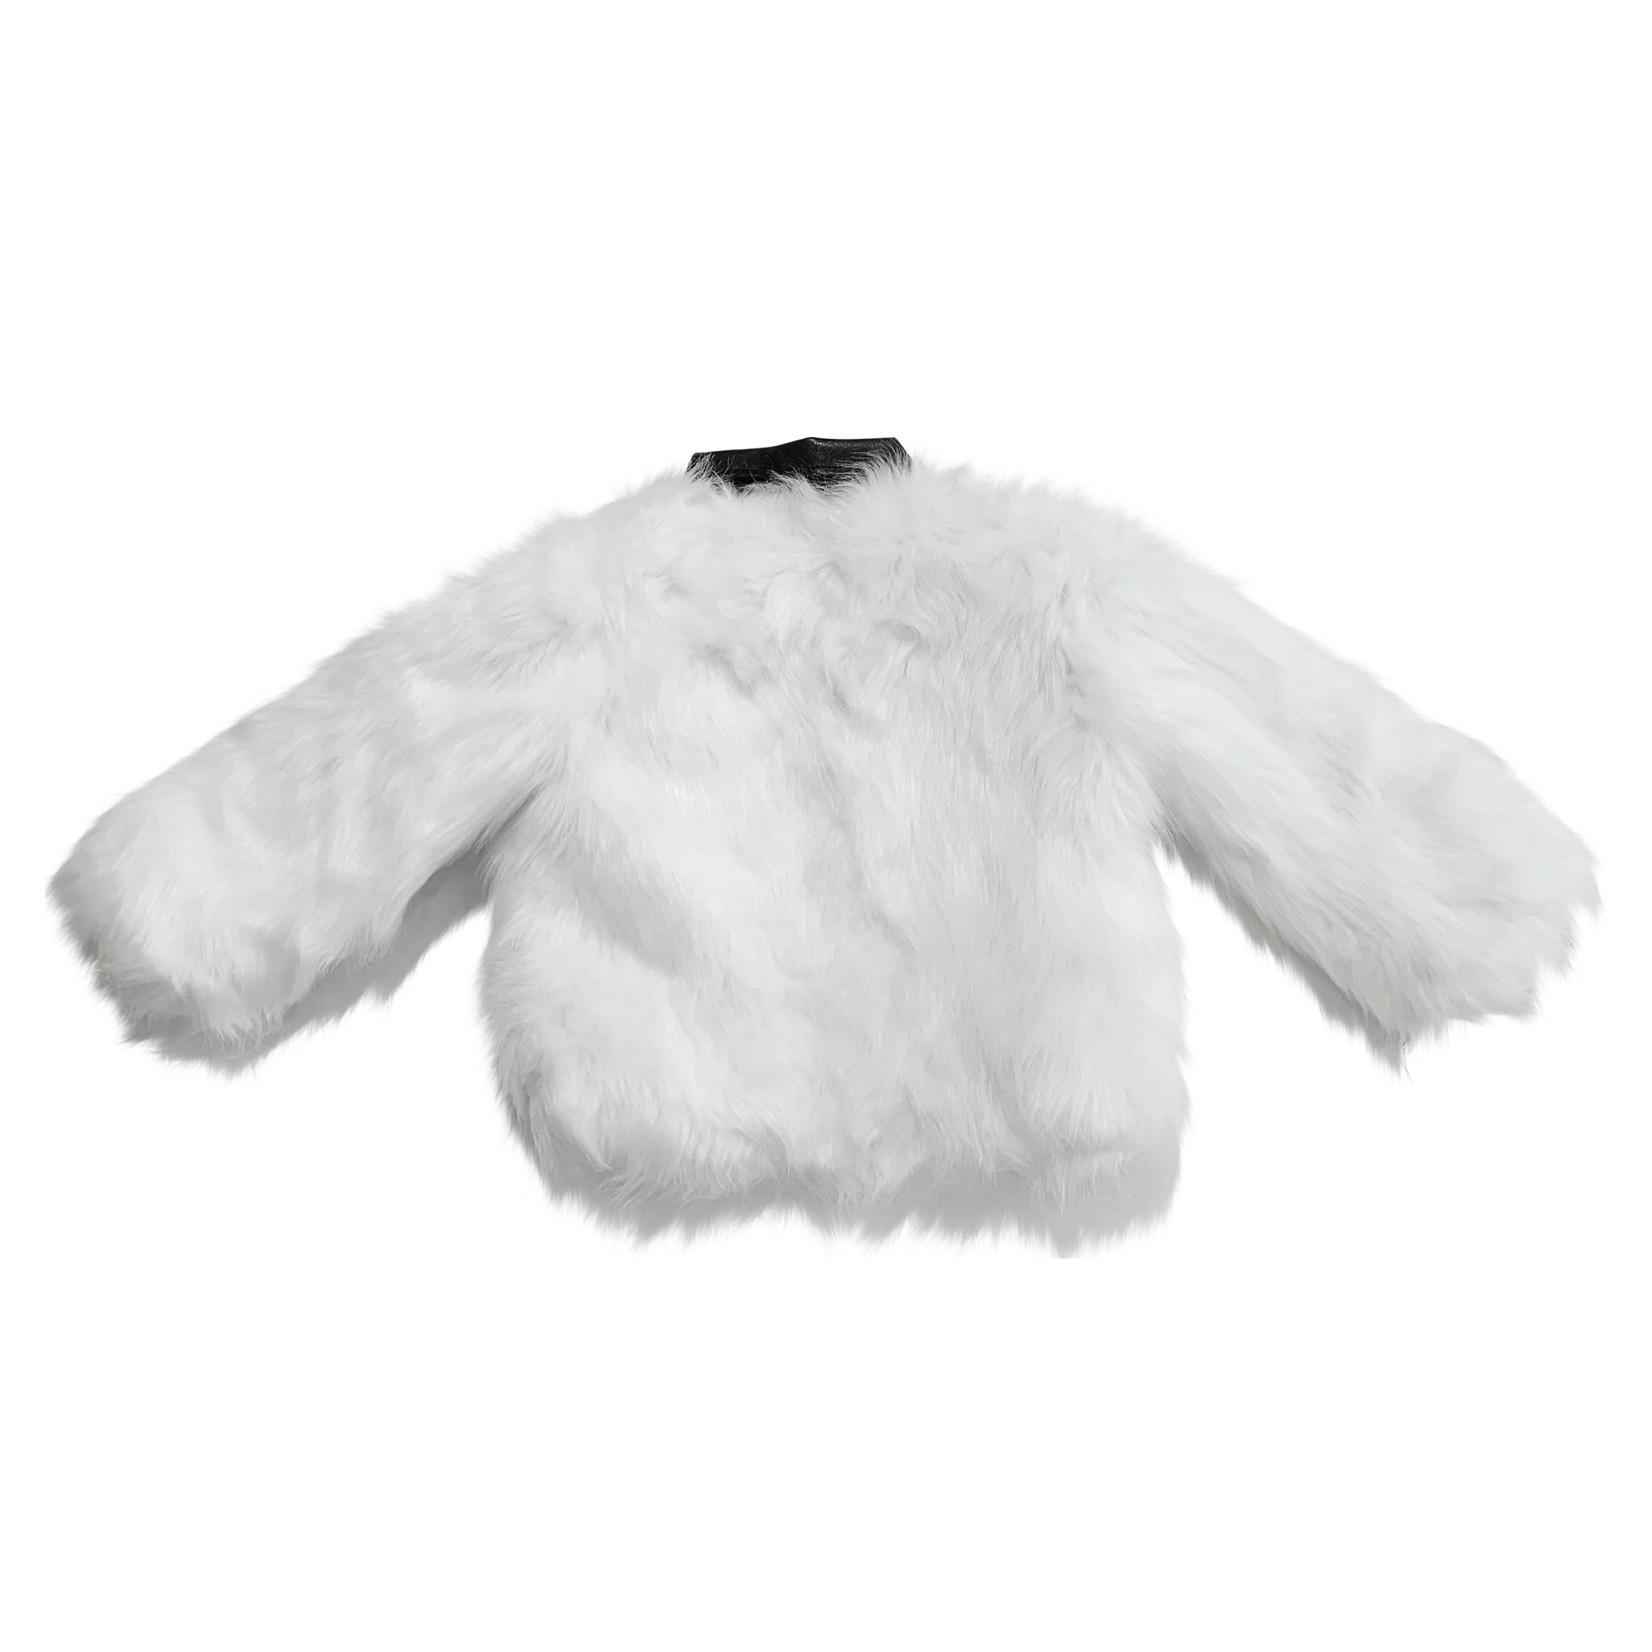 Wyld Blue White Fur Jacket Leather Collar 18M